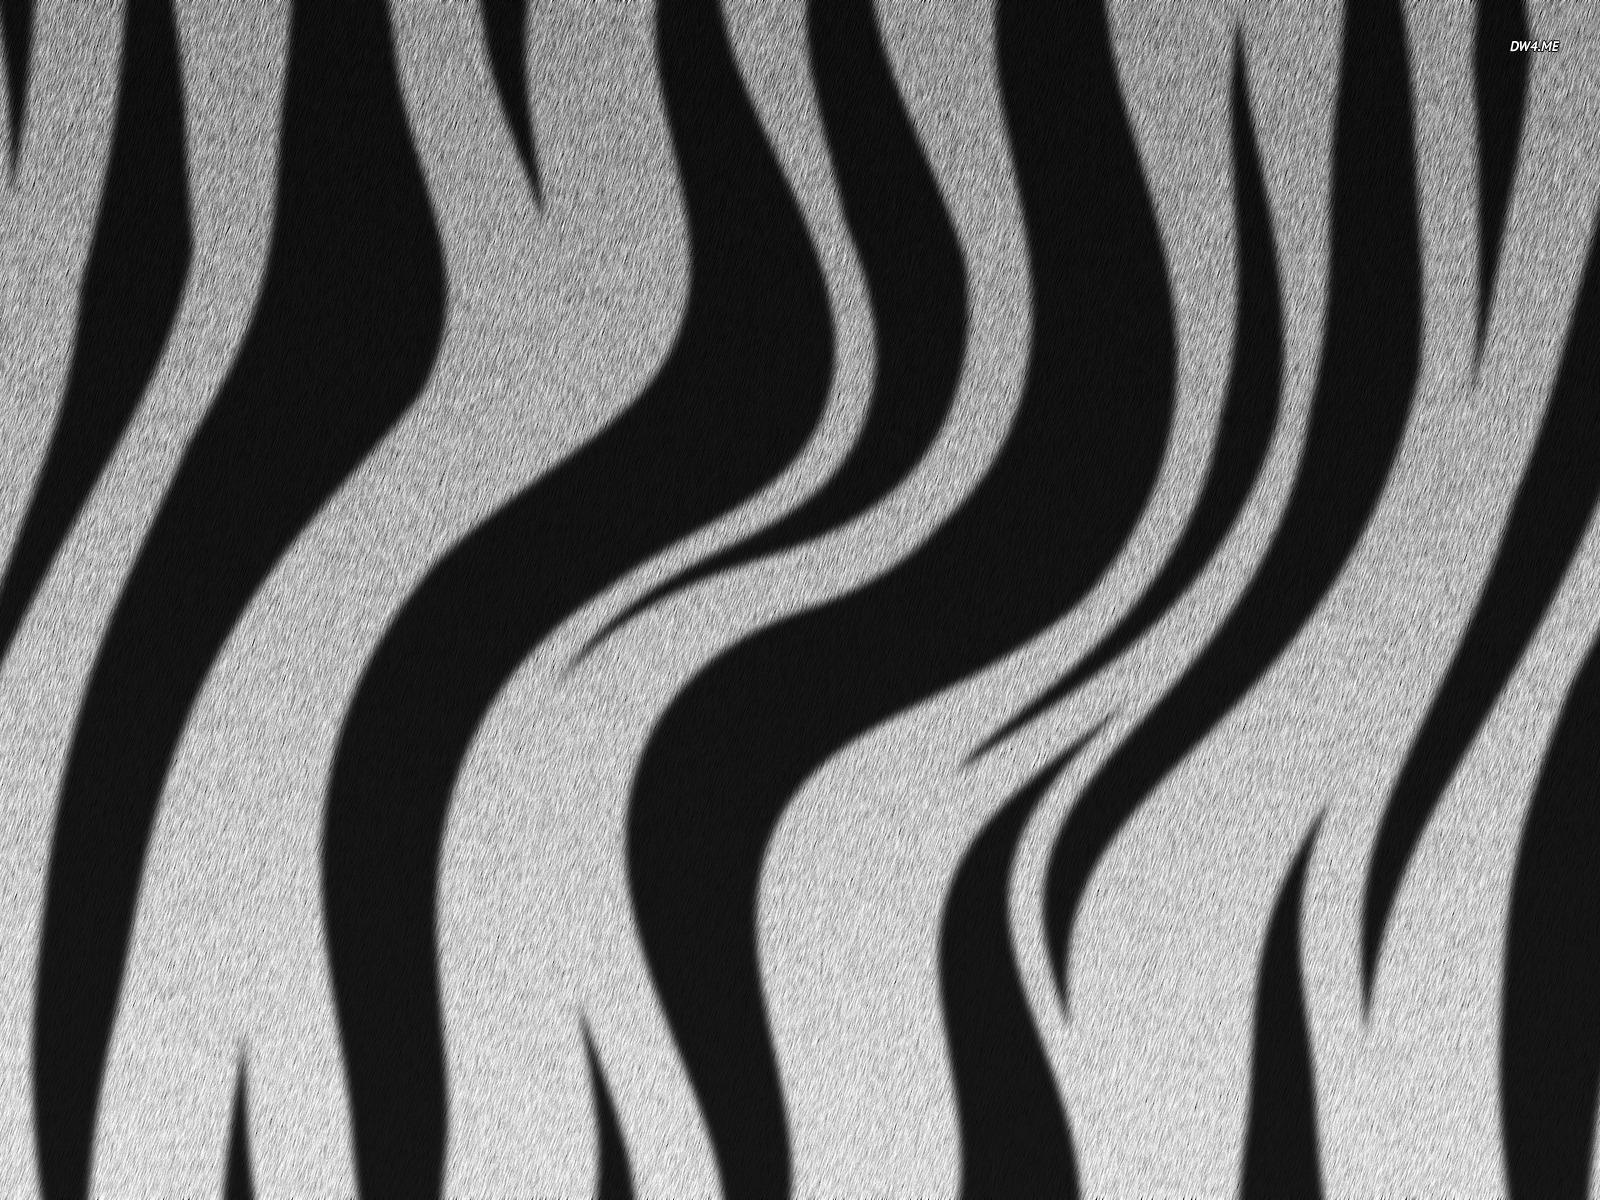 Zebra stripes wallpaper   Digital Art wallpapers   752 1600x1200